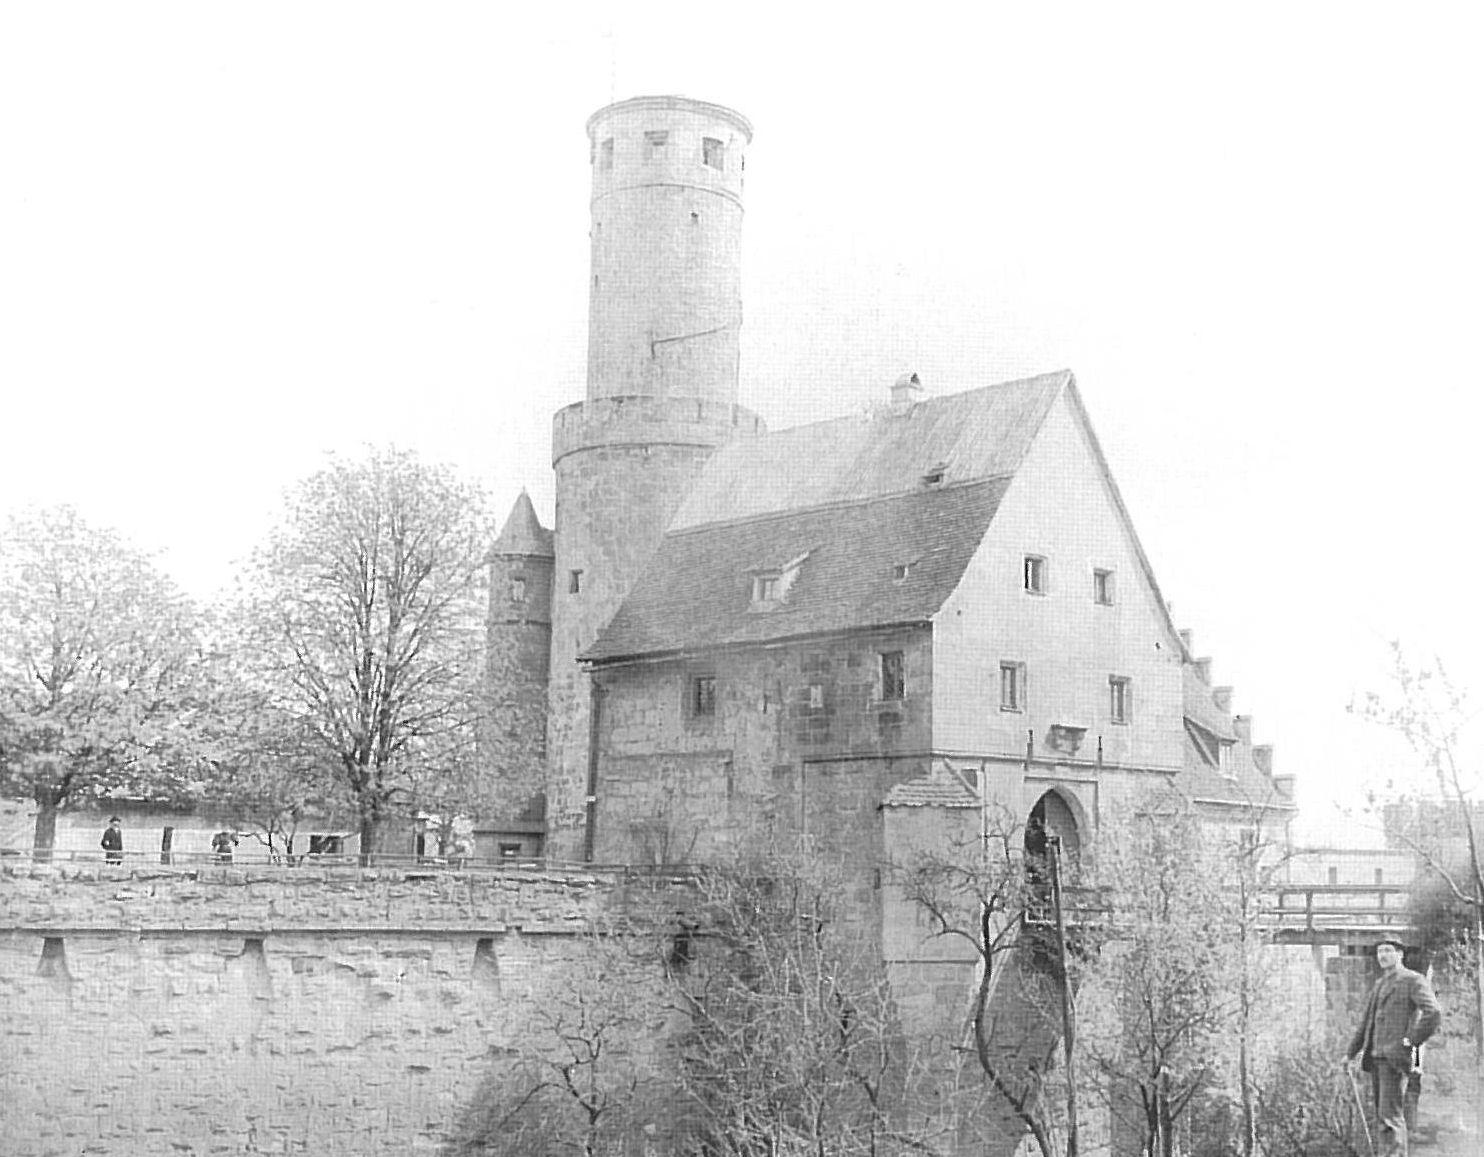 Badausstellung Bamberg altenburg bamberg